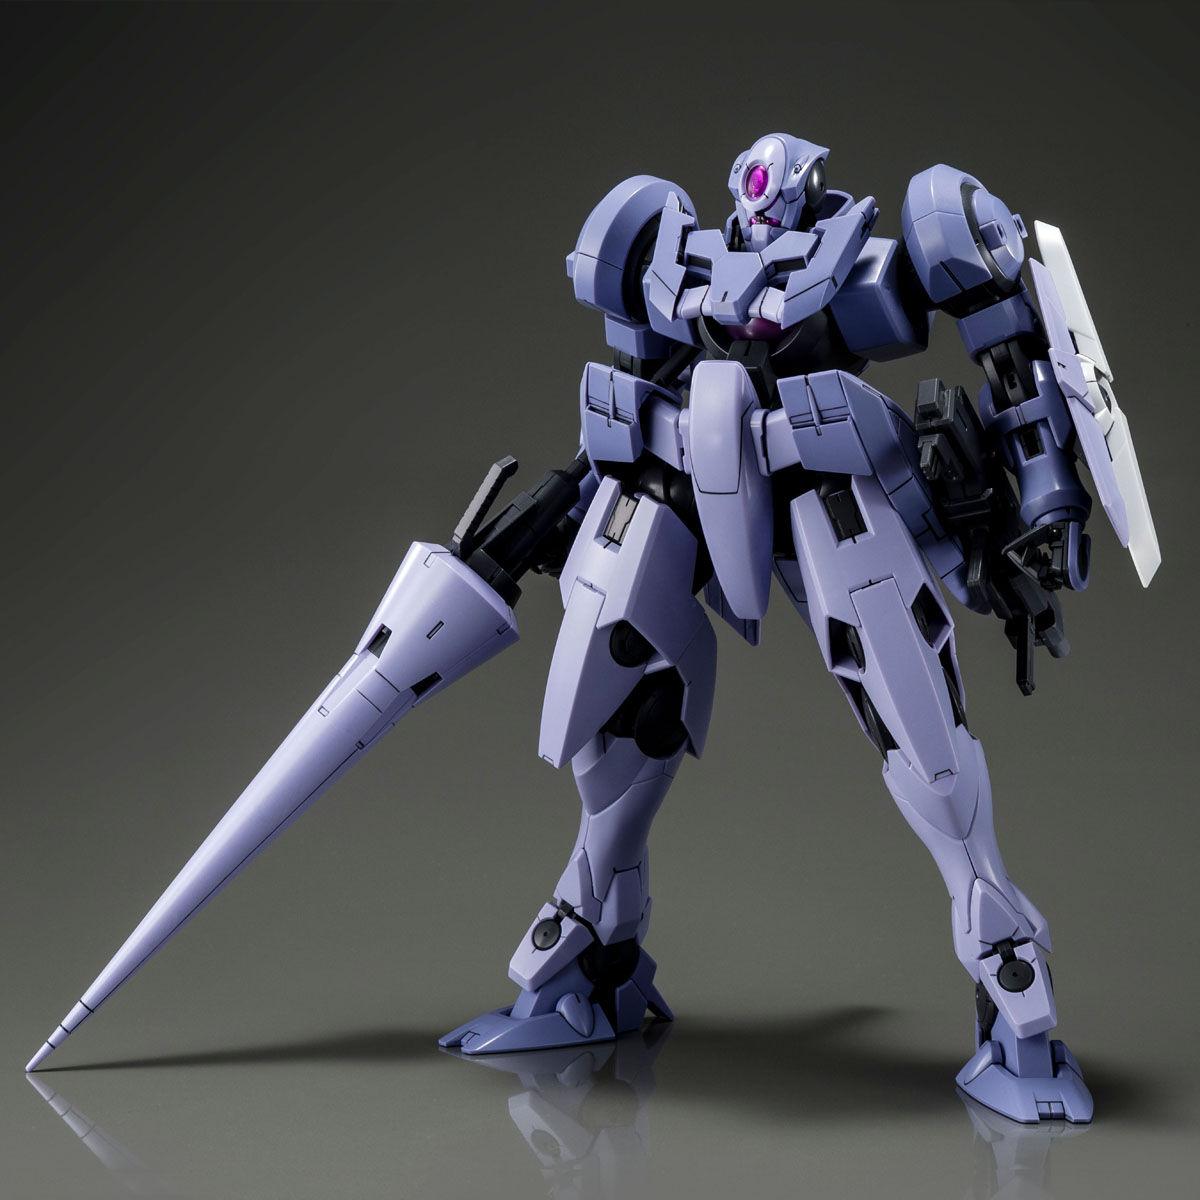 MG 1/100 GNX-609T ジンクスIII (連邦カラー)